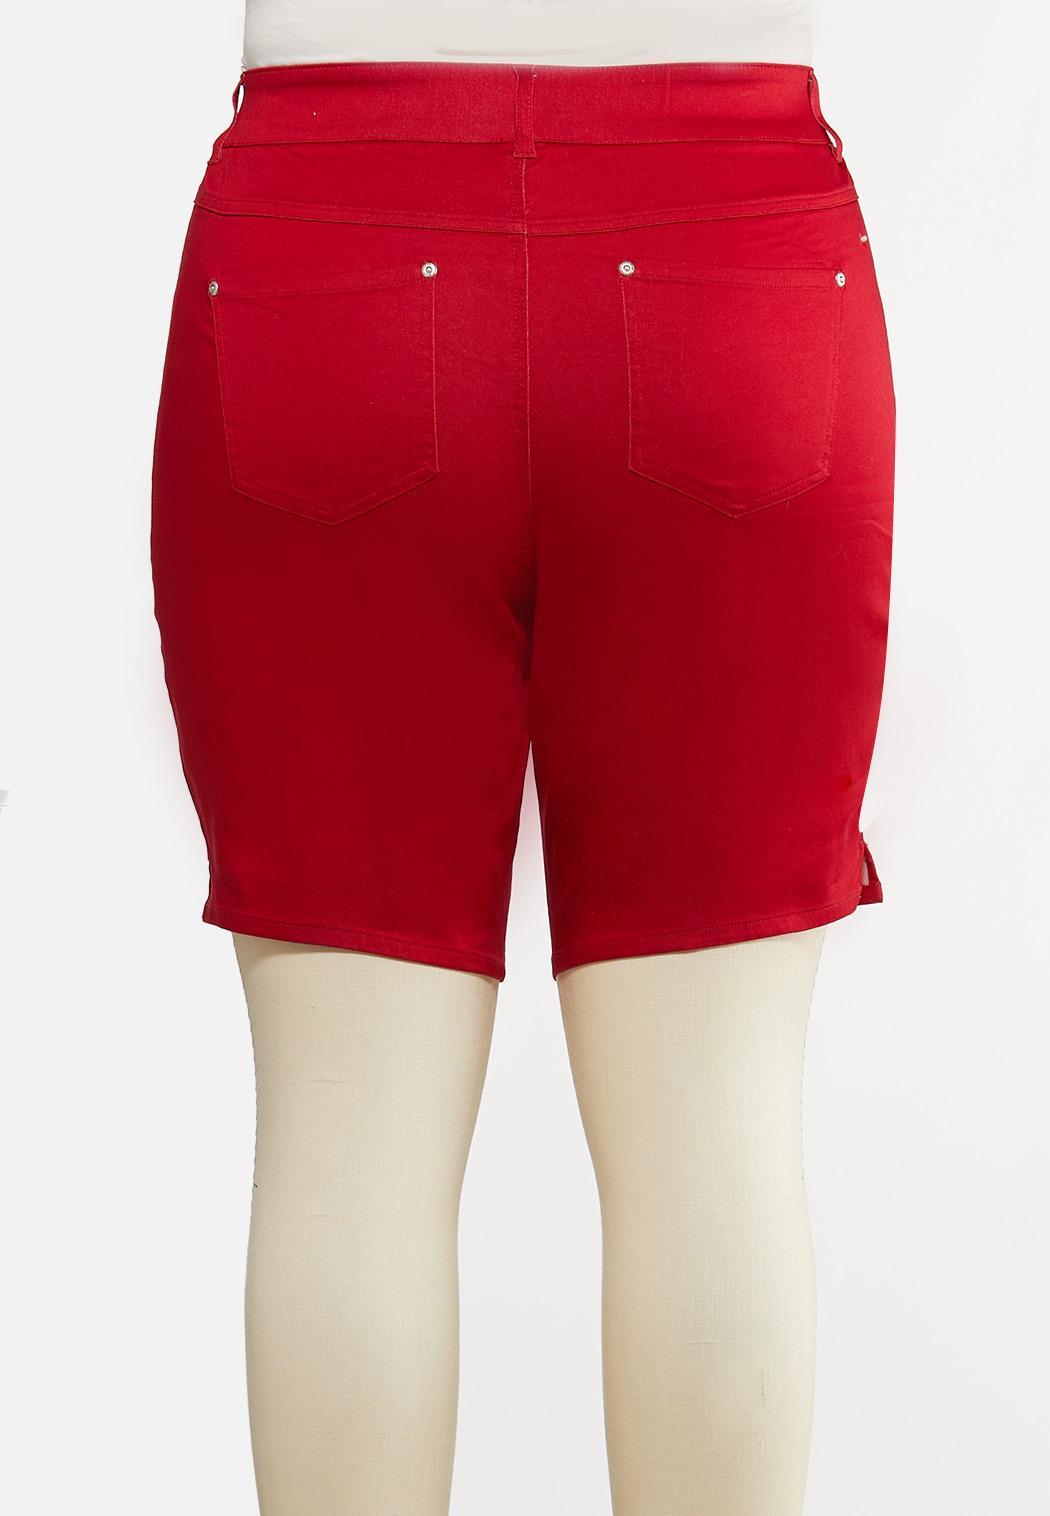 Plus Size Red Curvy Denim Shorts (Item #44193364)